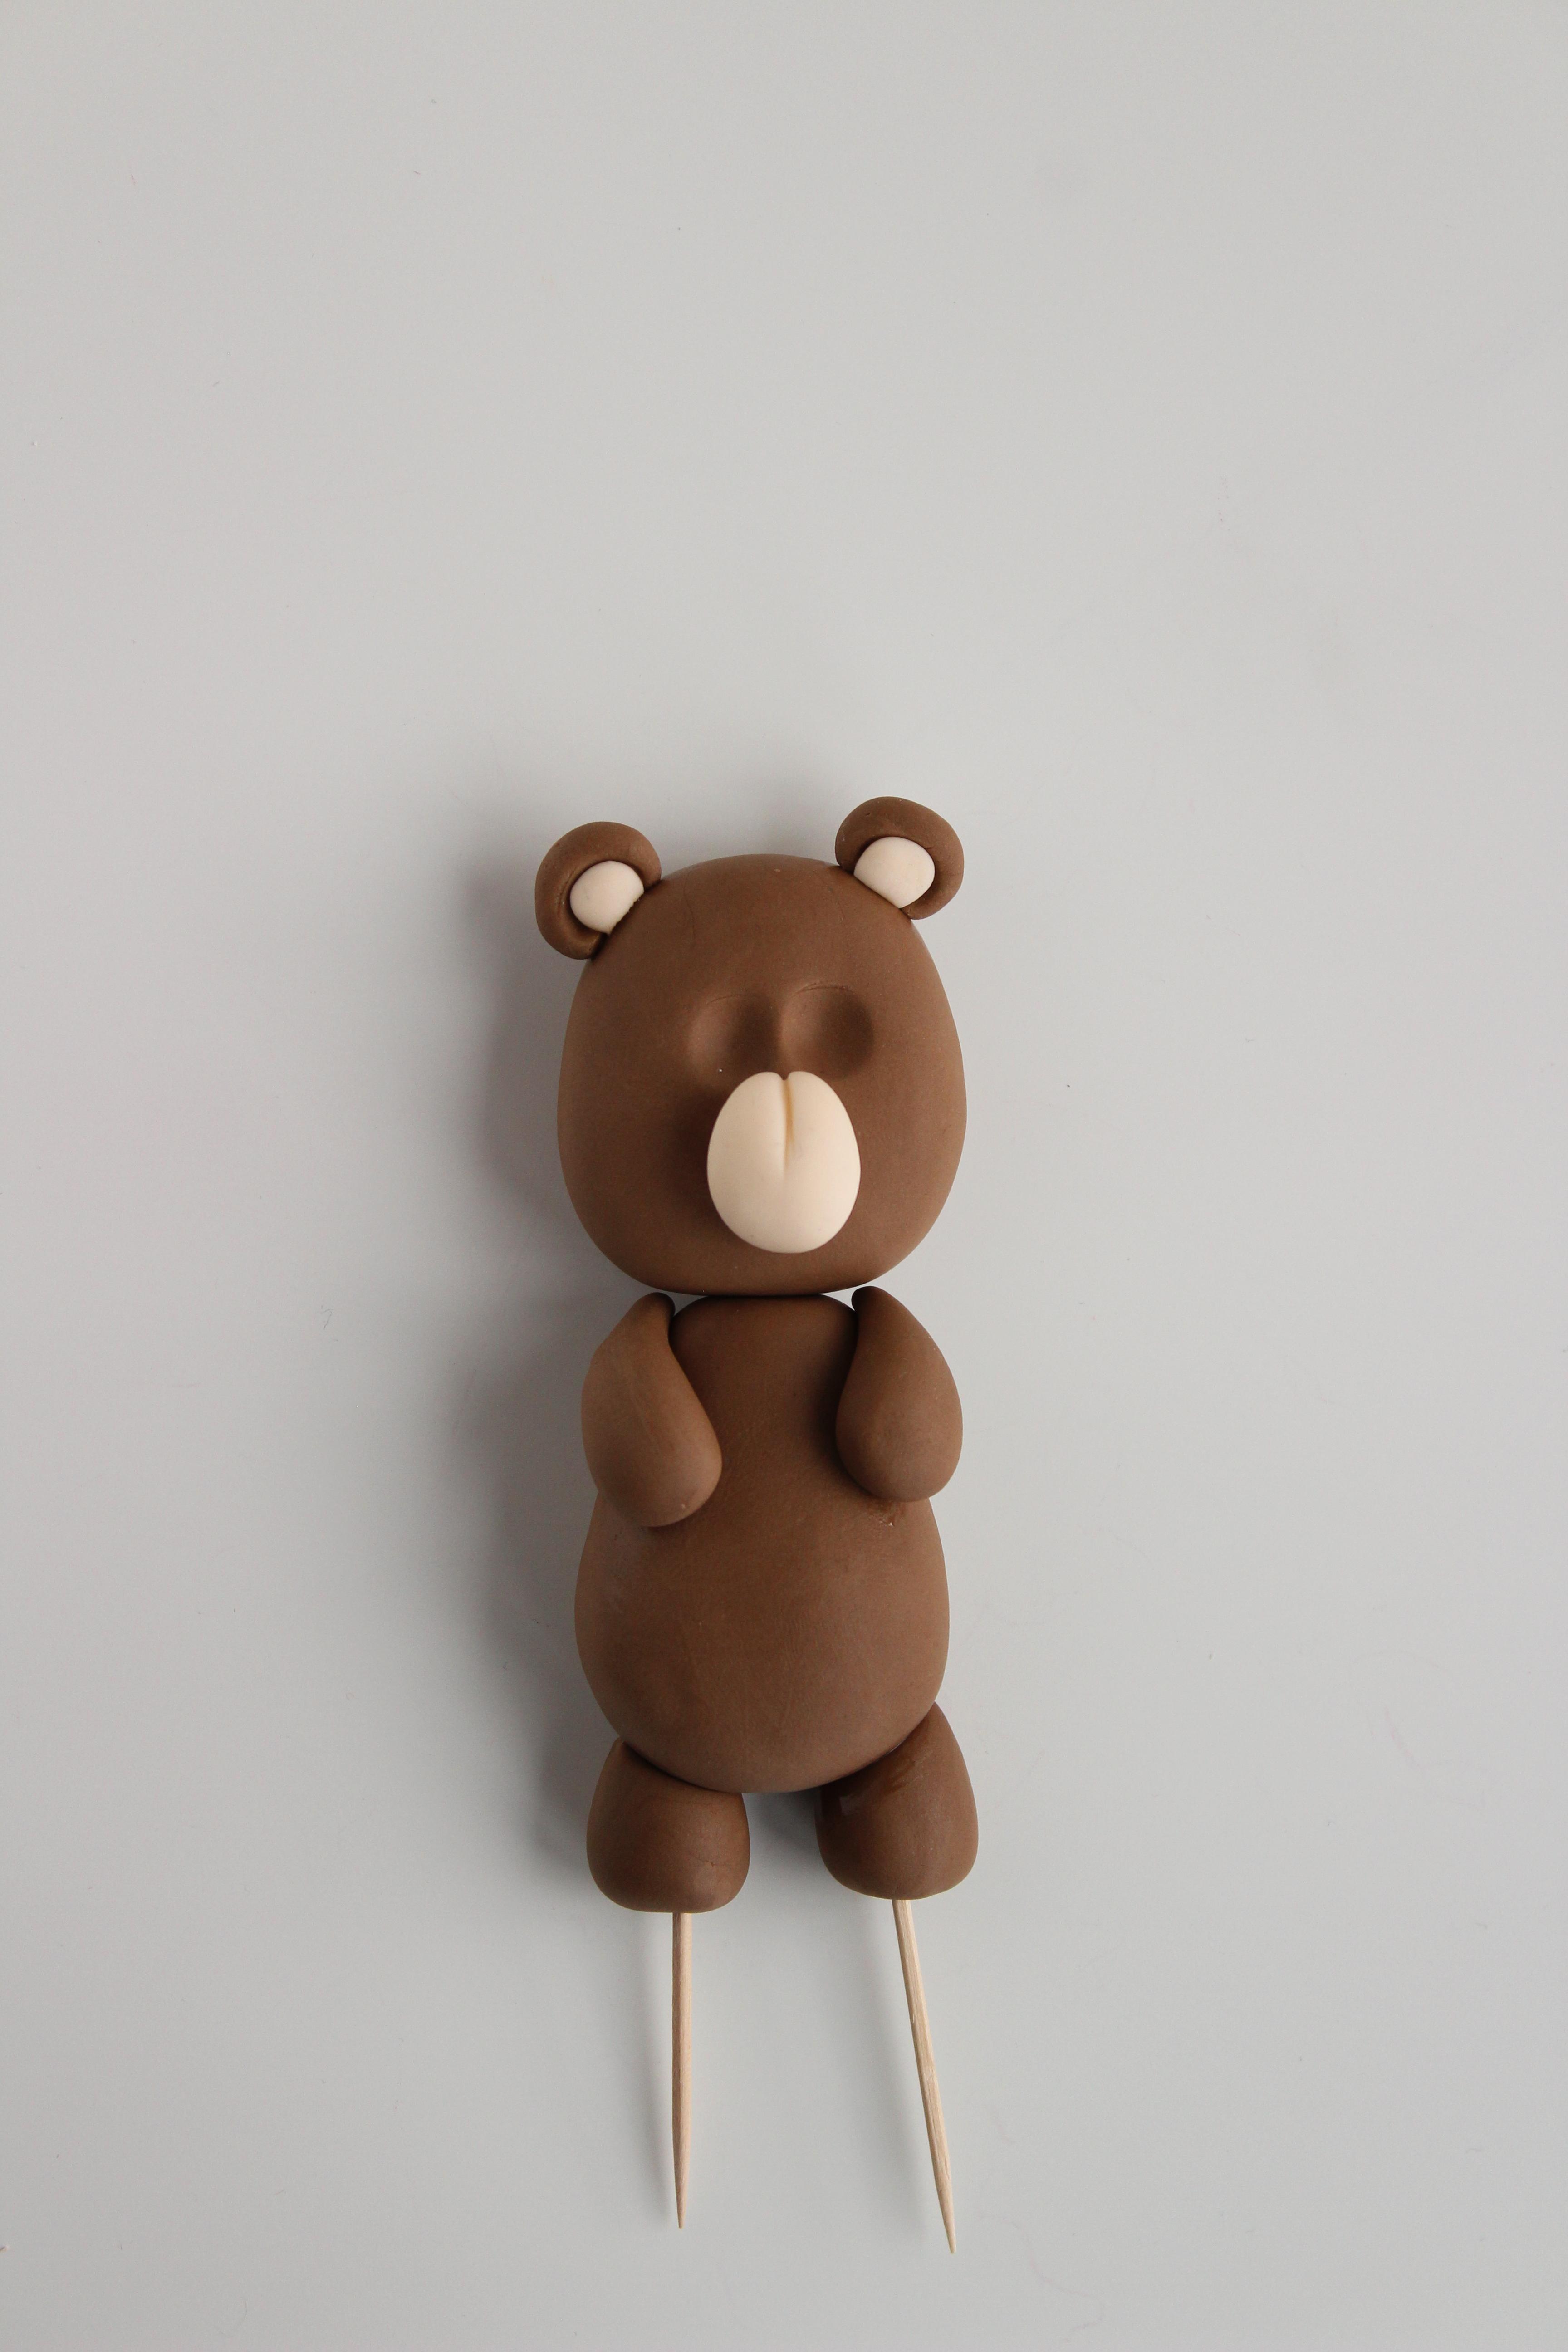 Party-Bear-Cake-6.JPG#asset:23967